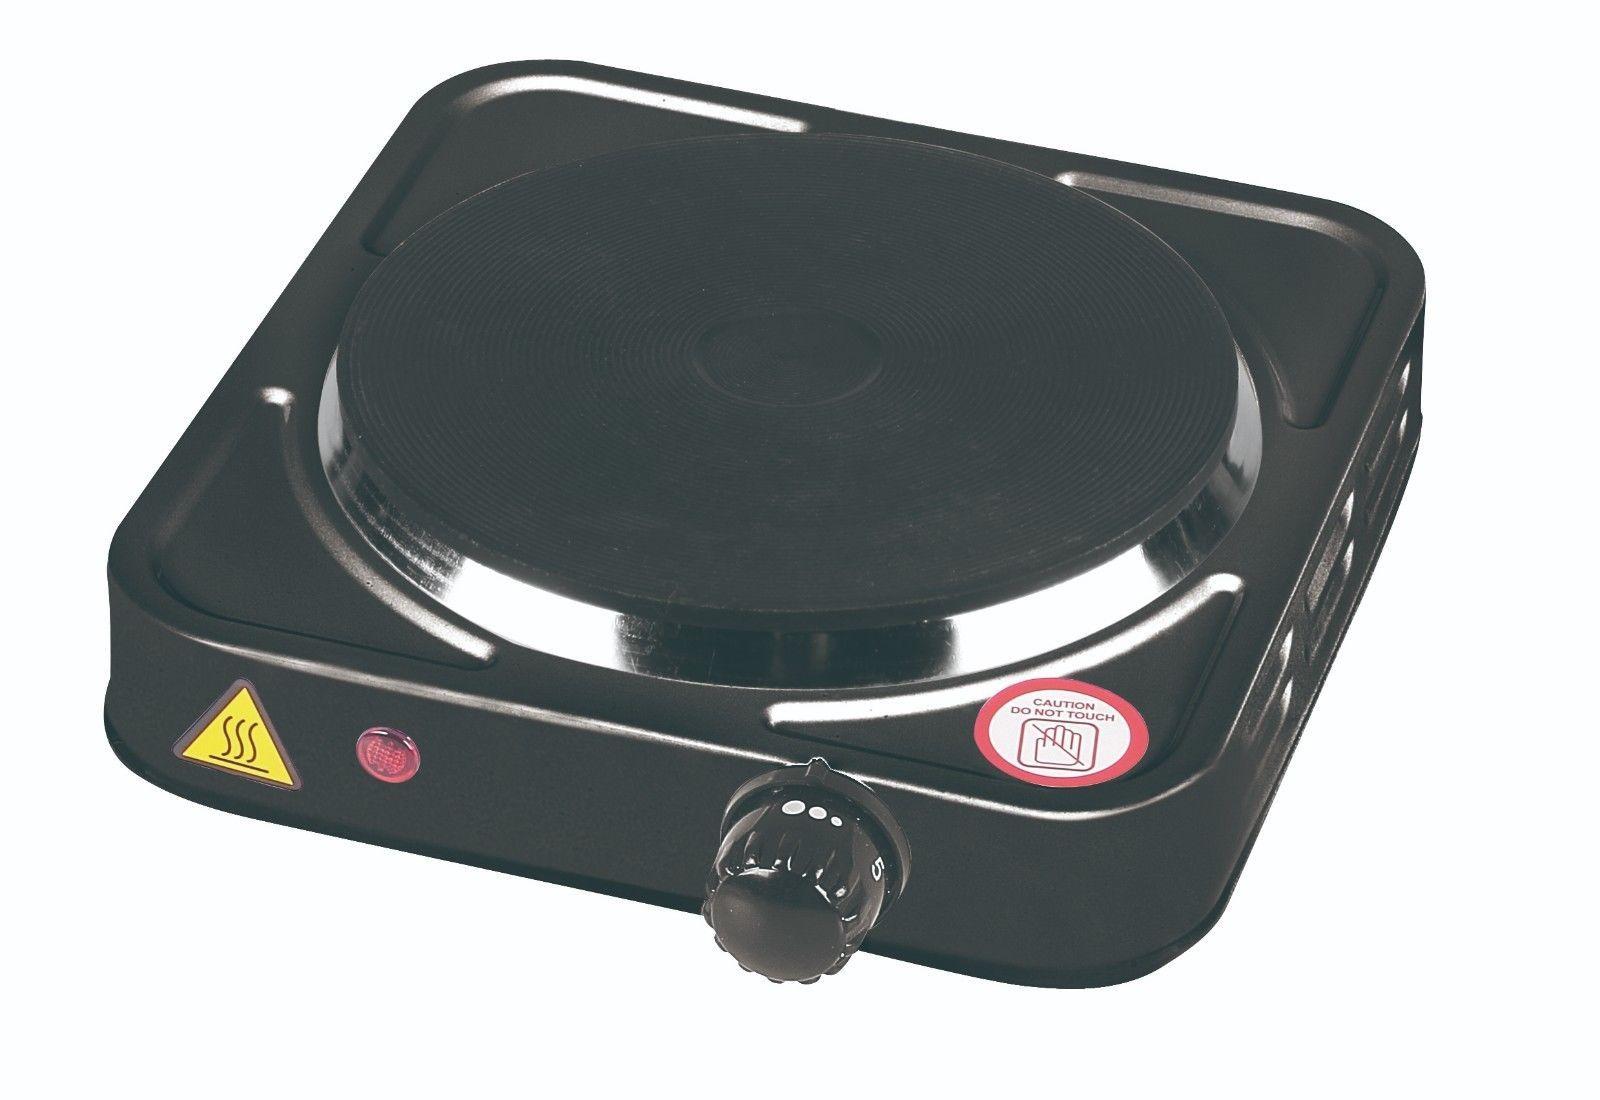 burners and hot plates 177751 emerald electric black single burner rh pinterest com